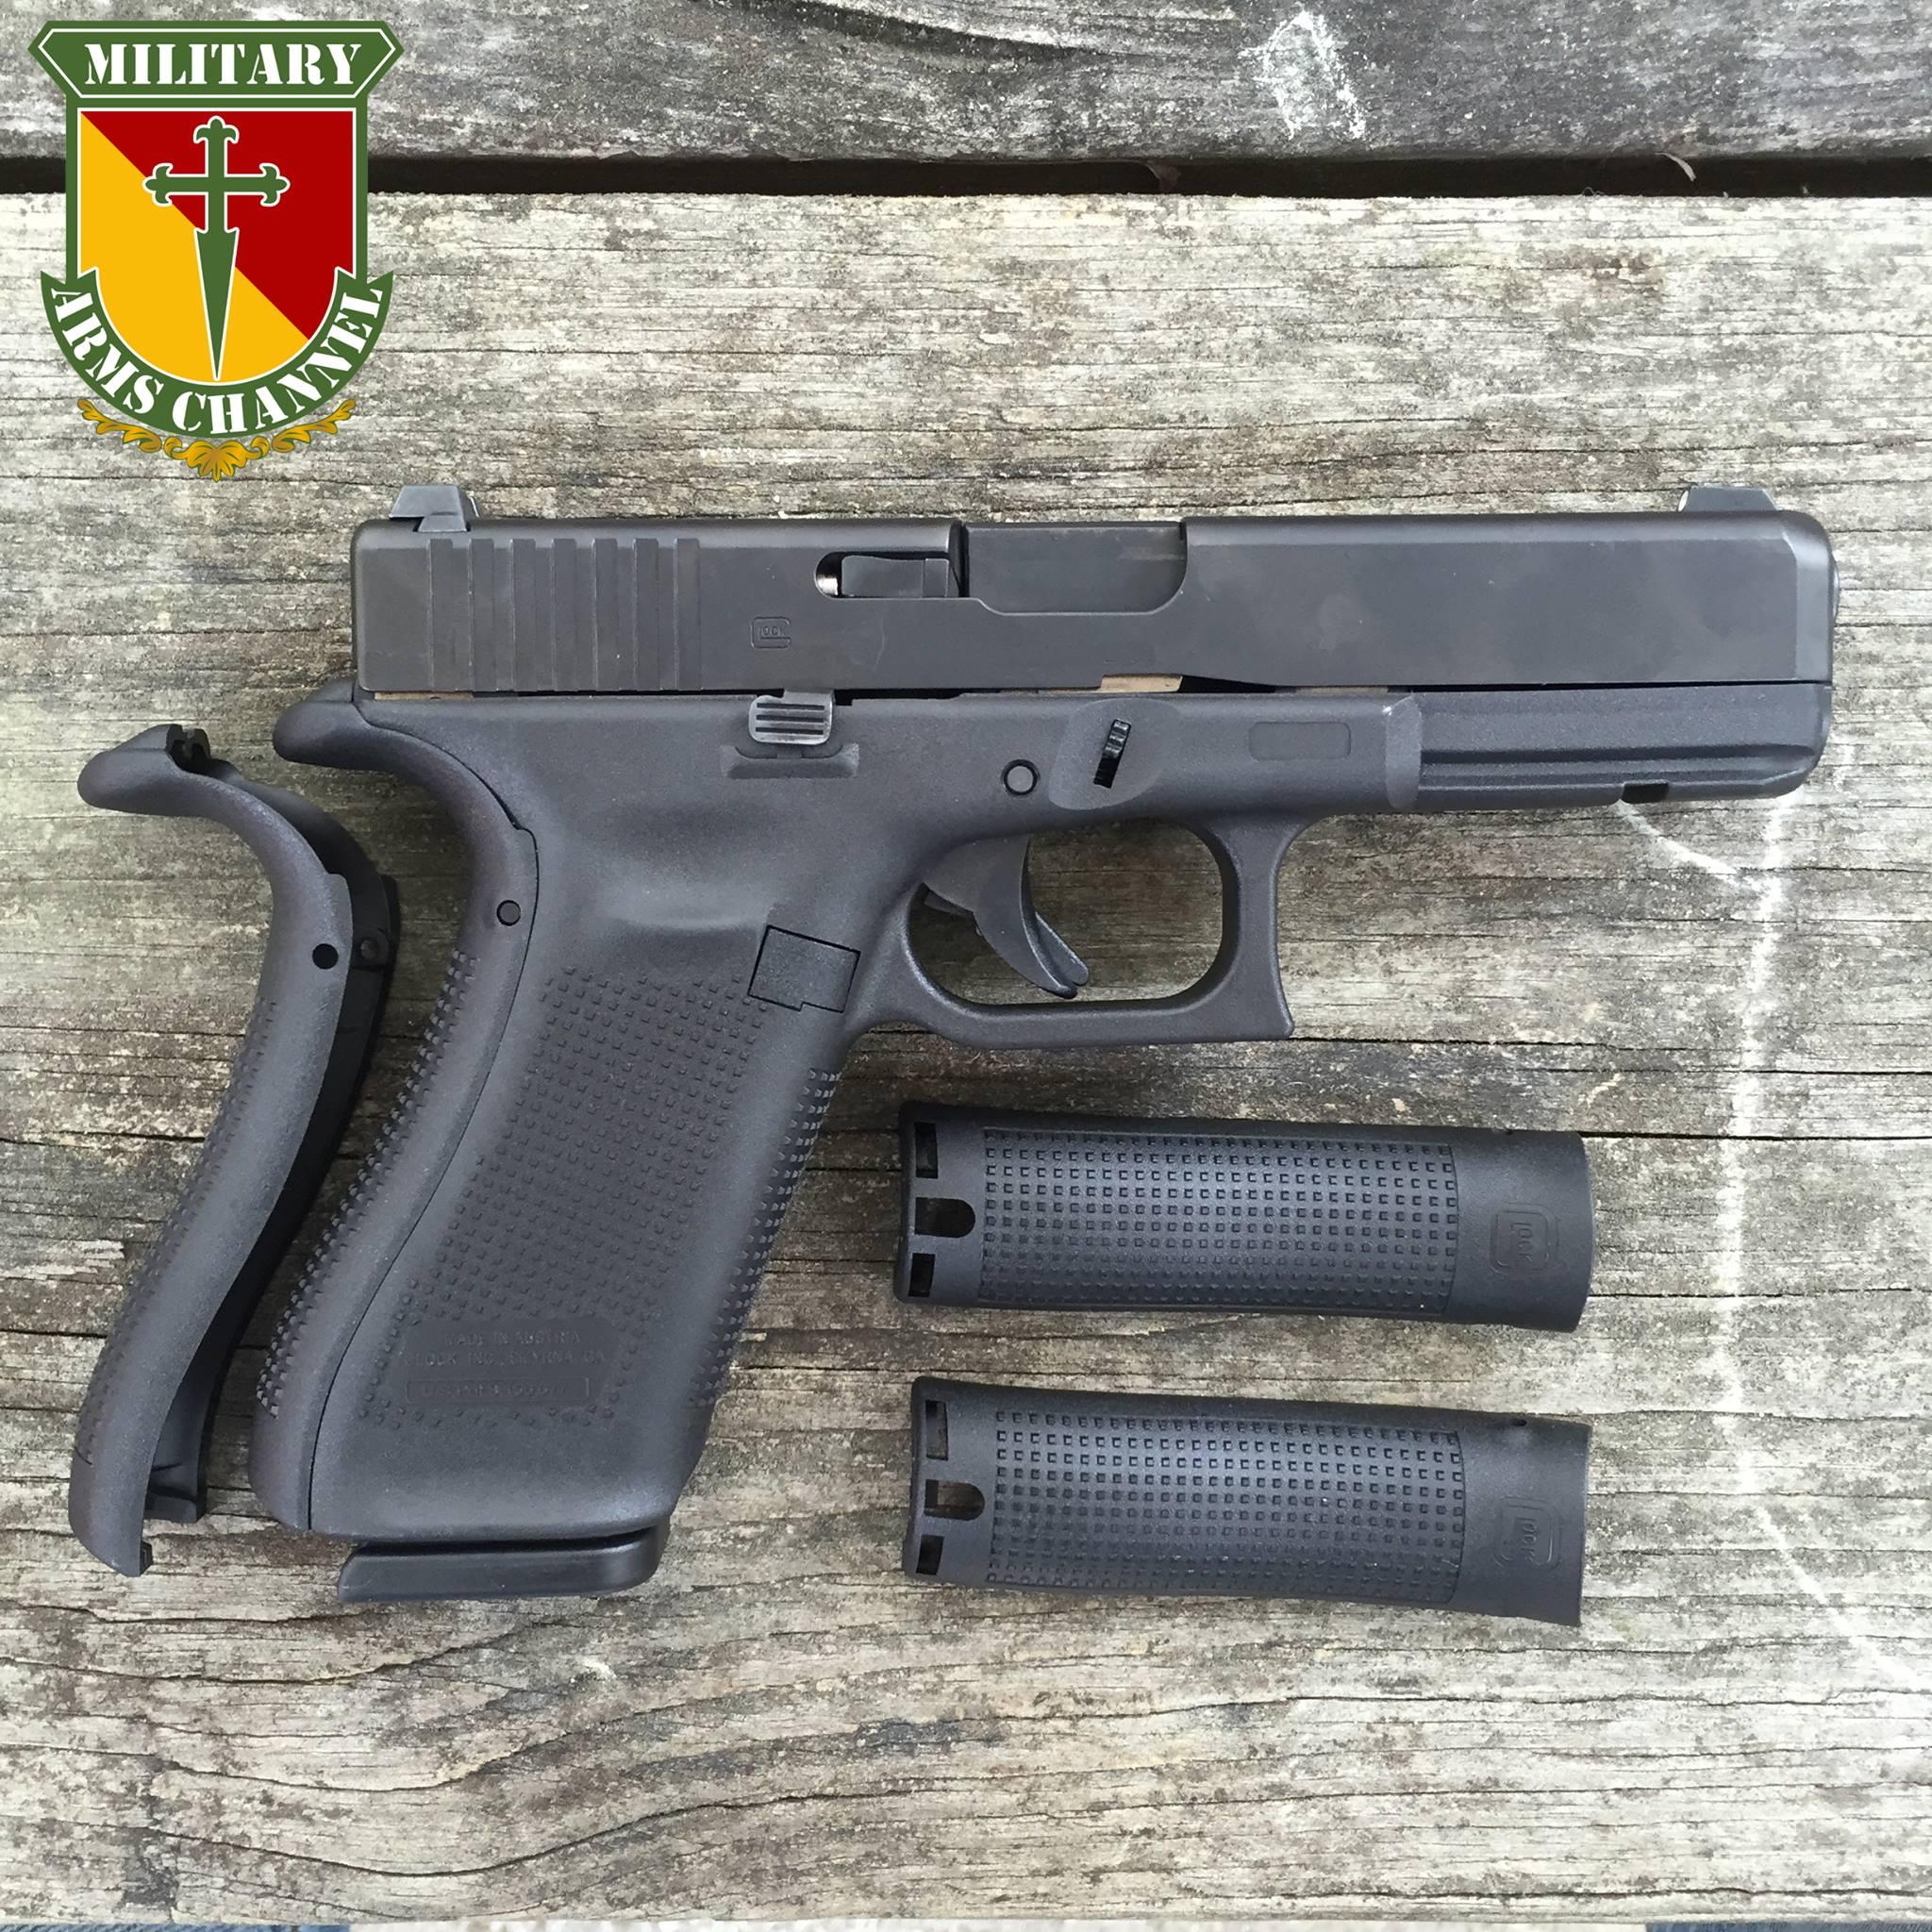 glock 17 M mmac